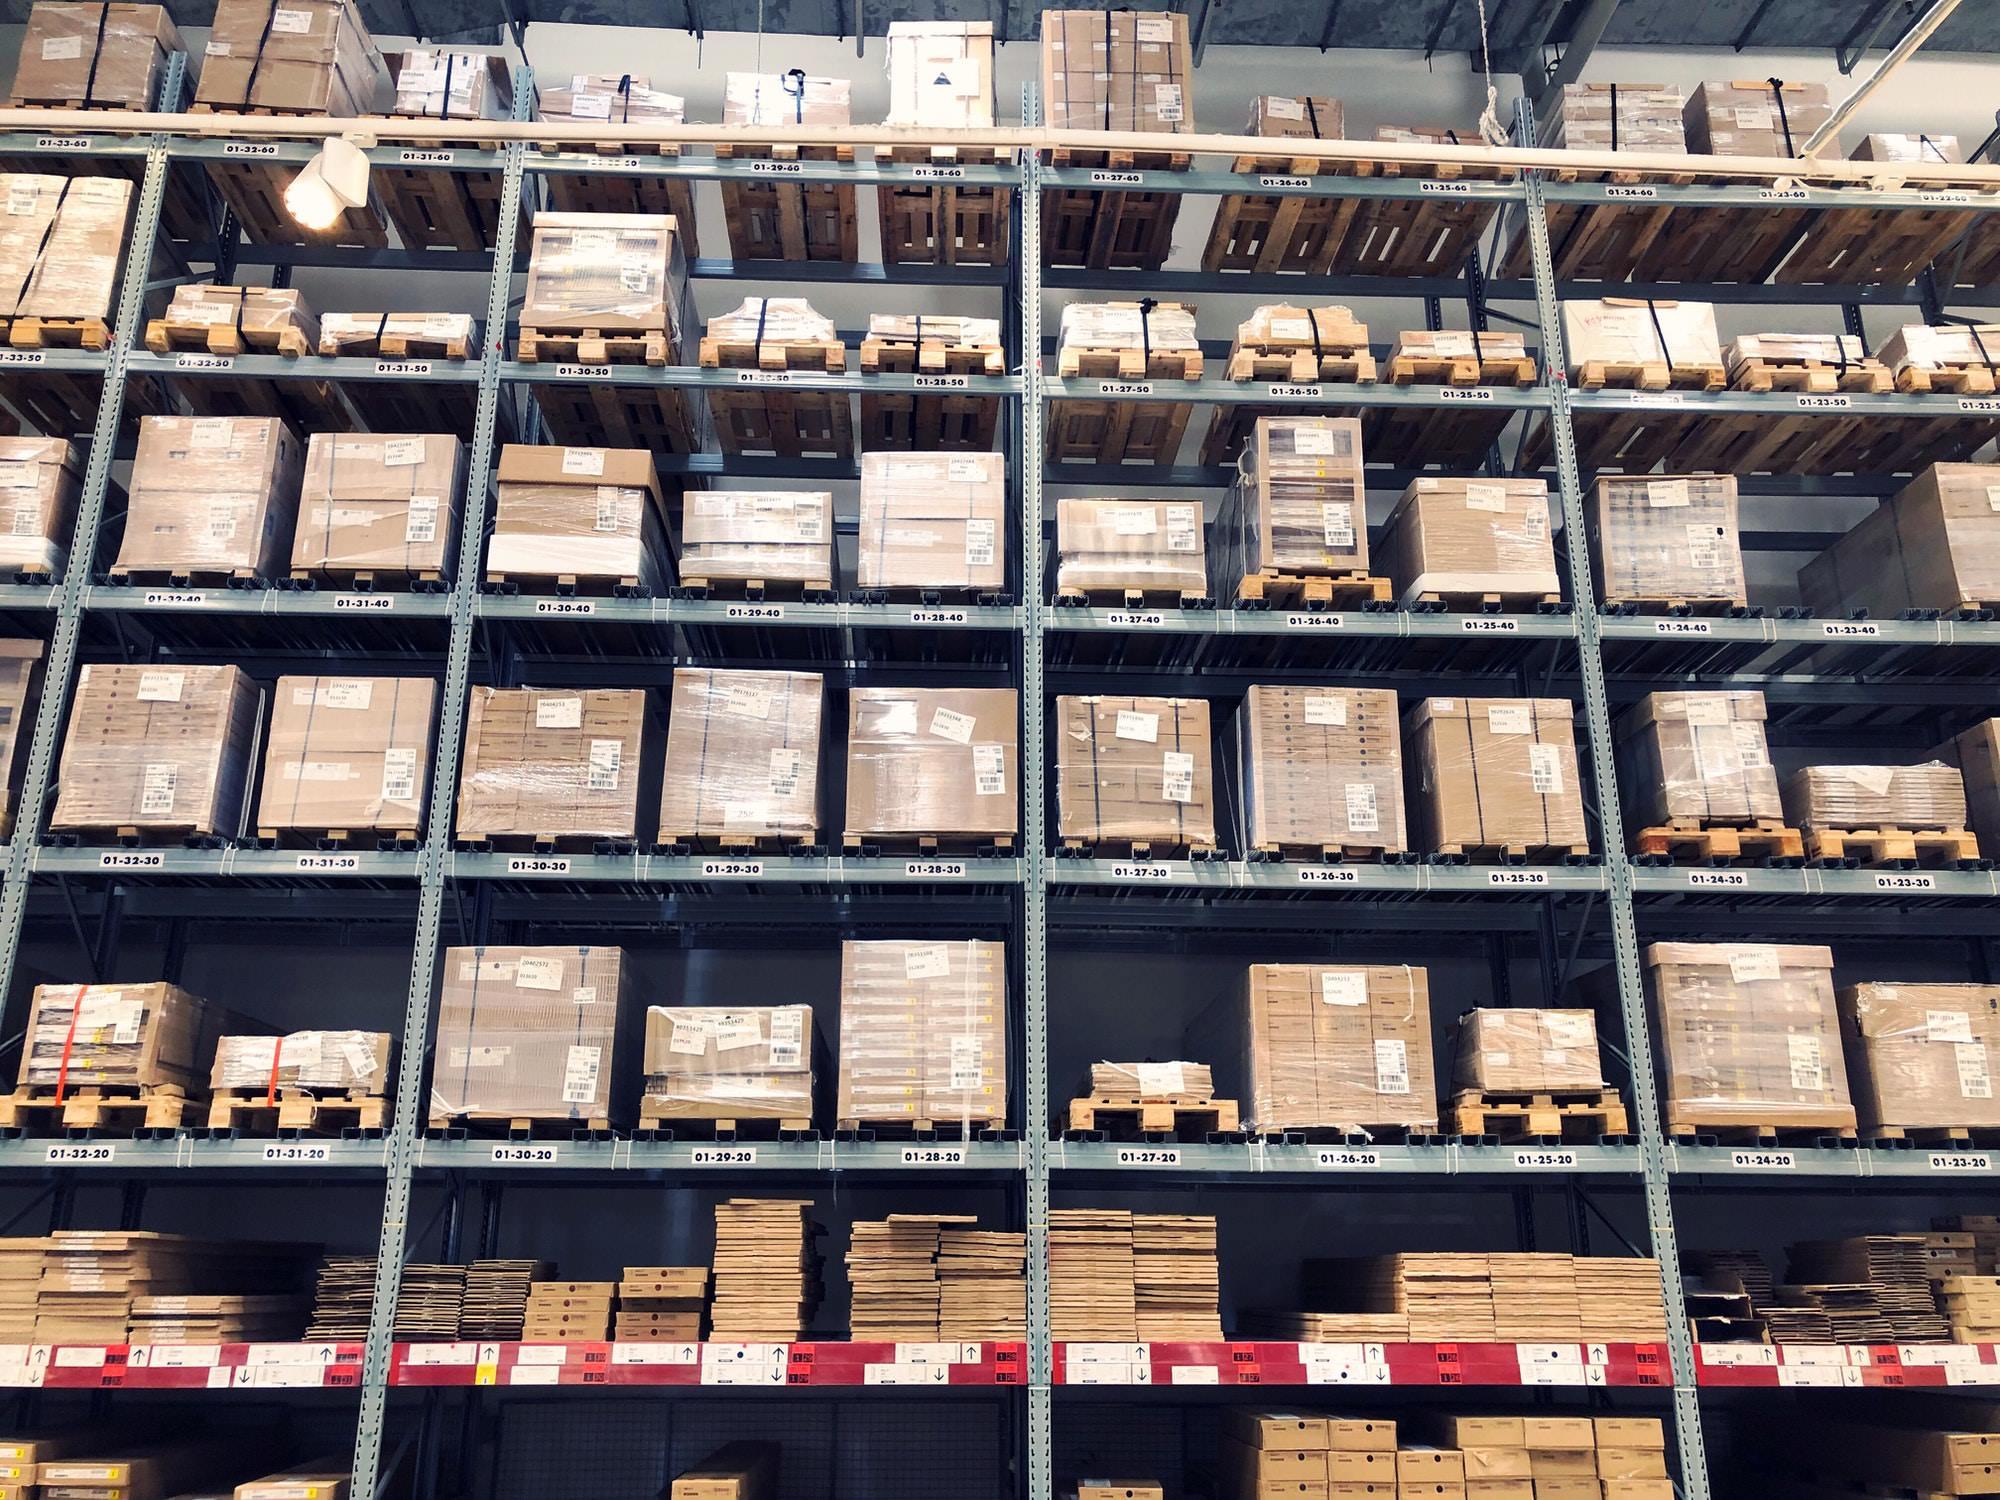 IKEA self-service storage shelves